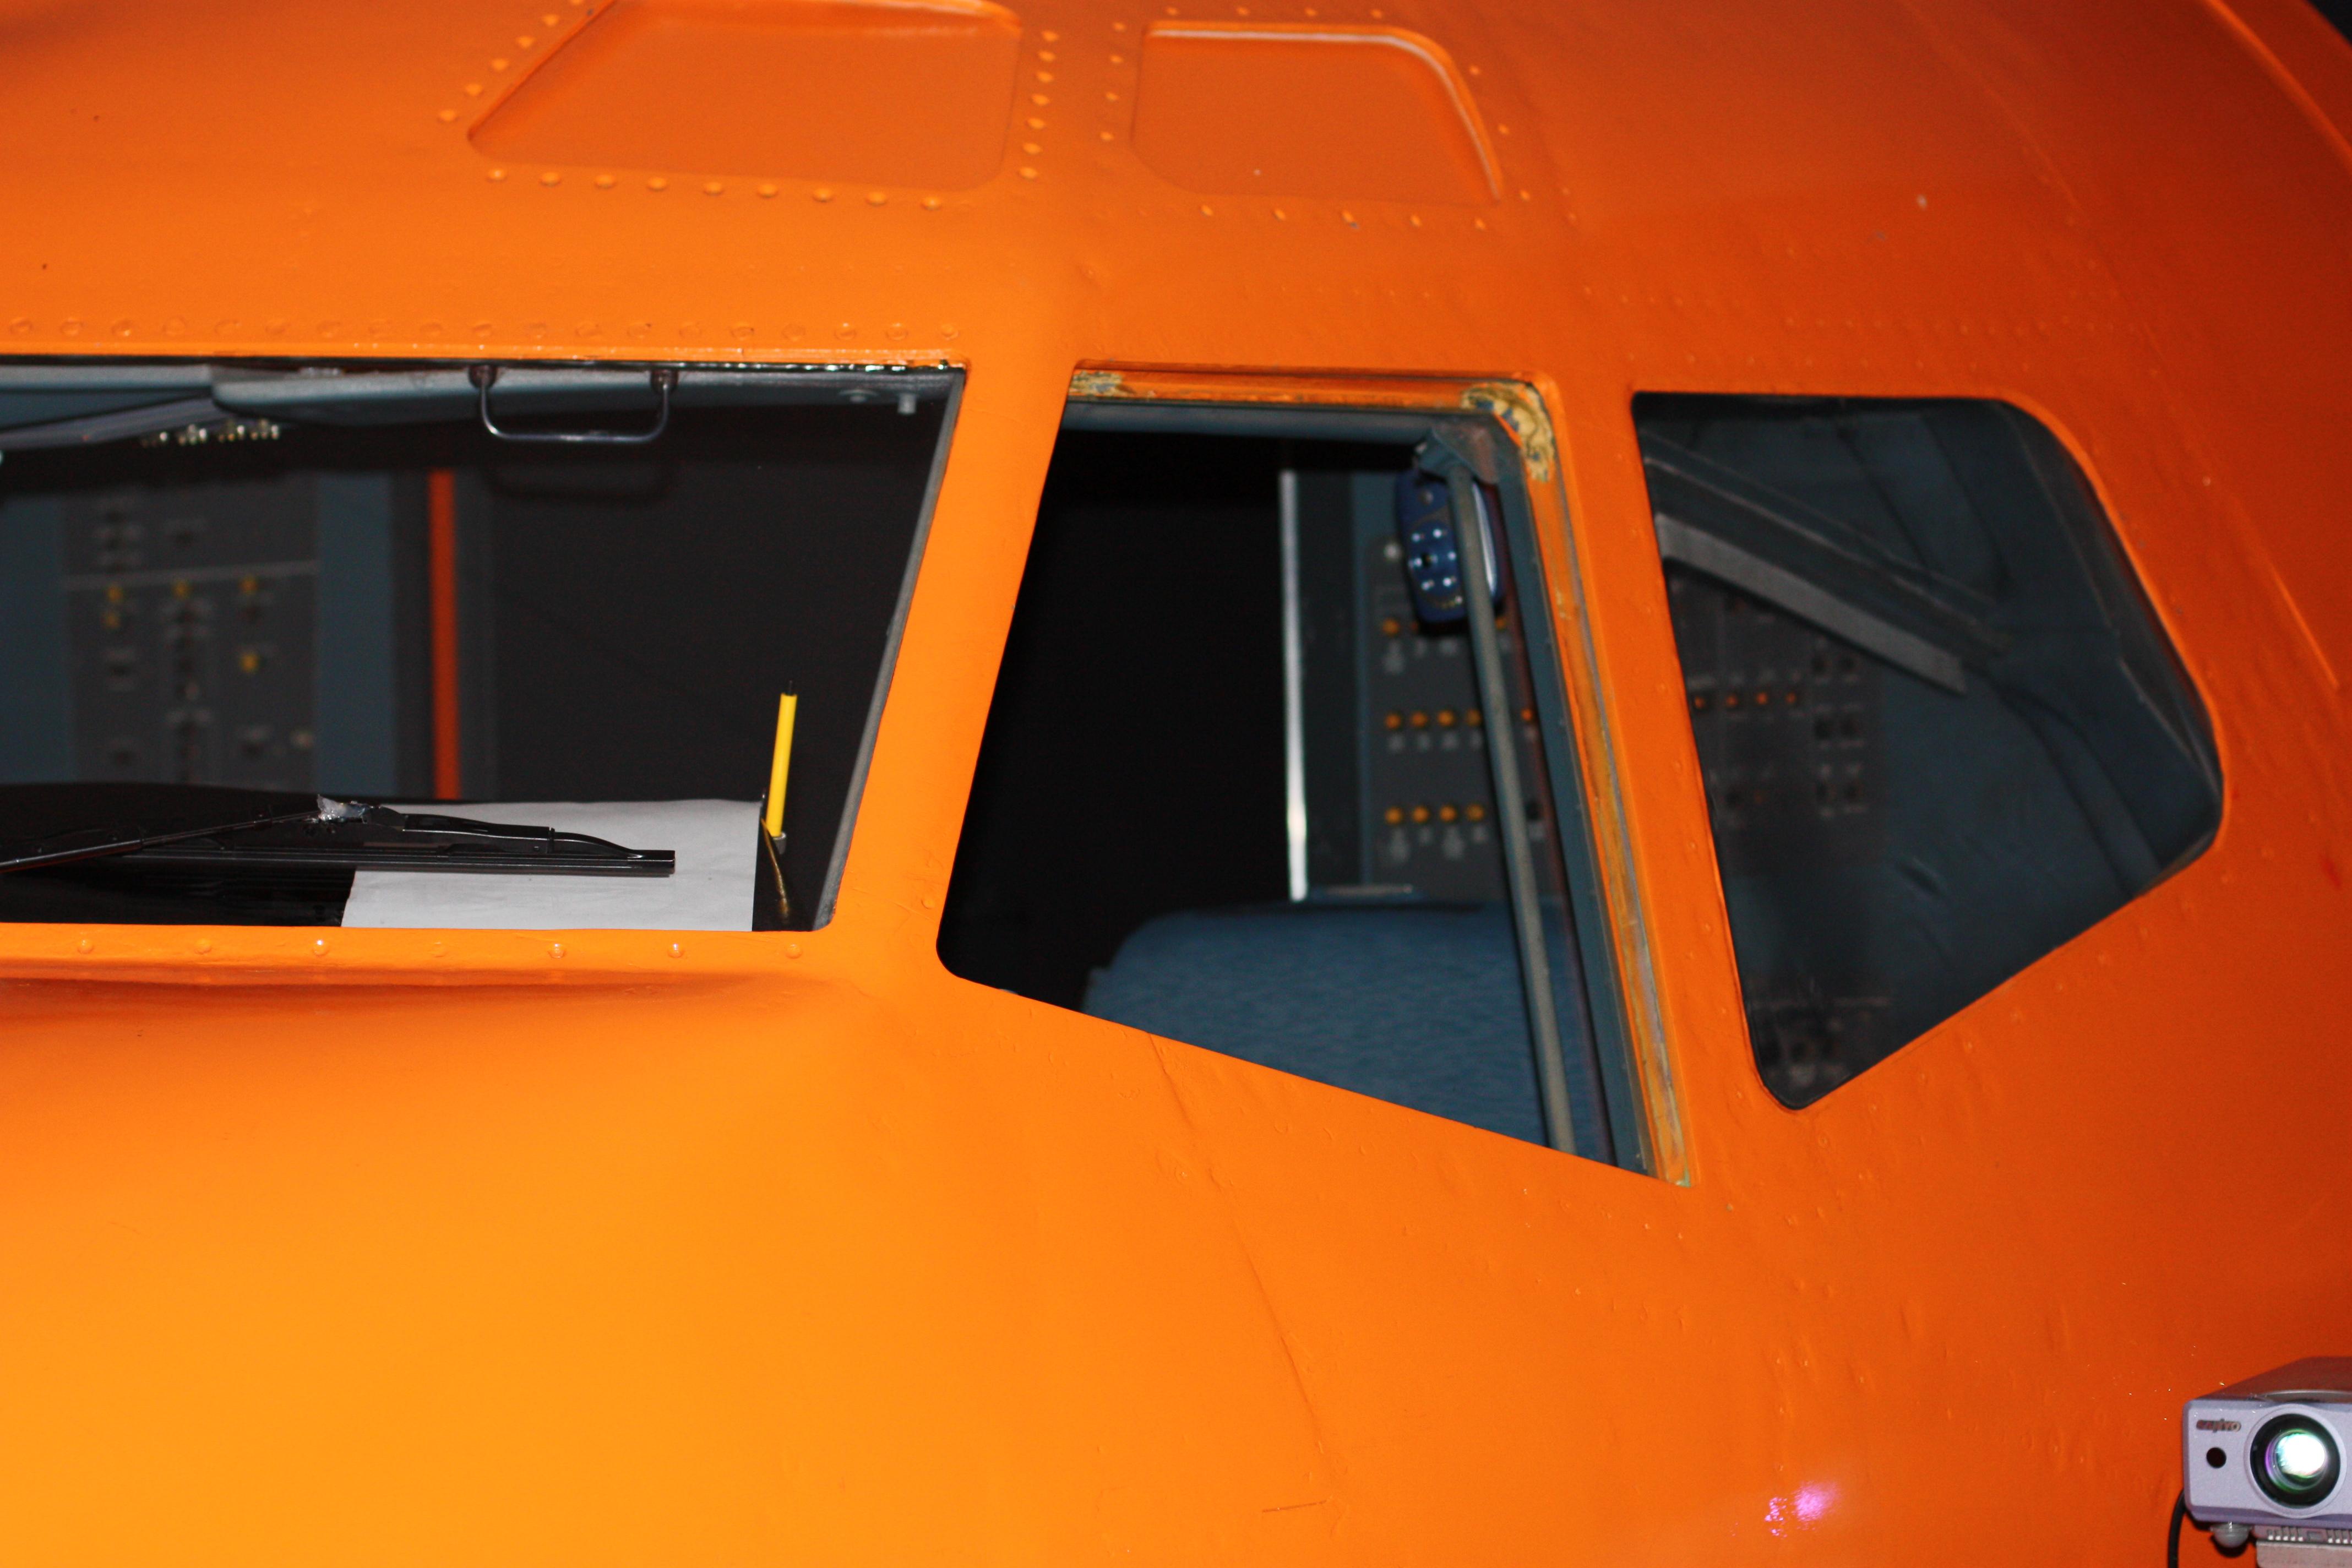 Cockpit_of_Boeing_737_700_Flight_Simulat